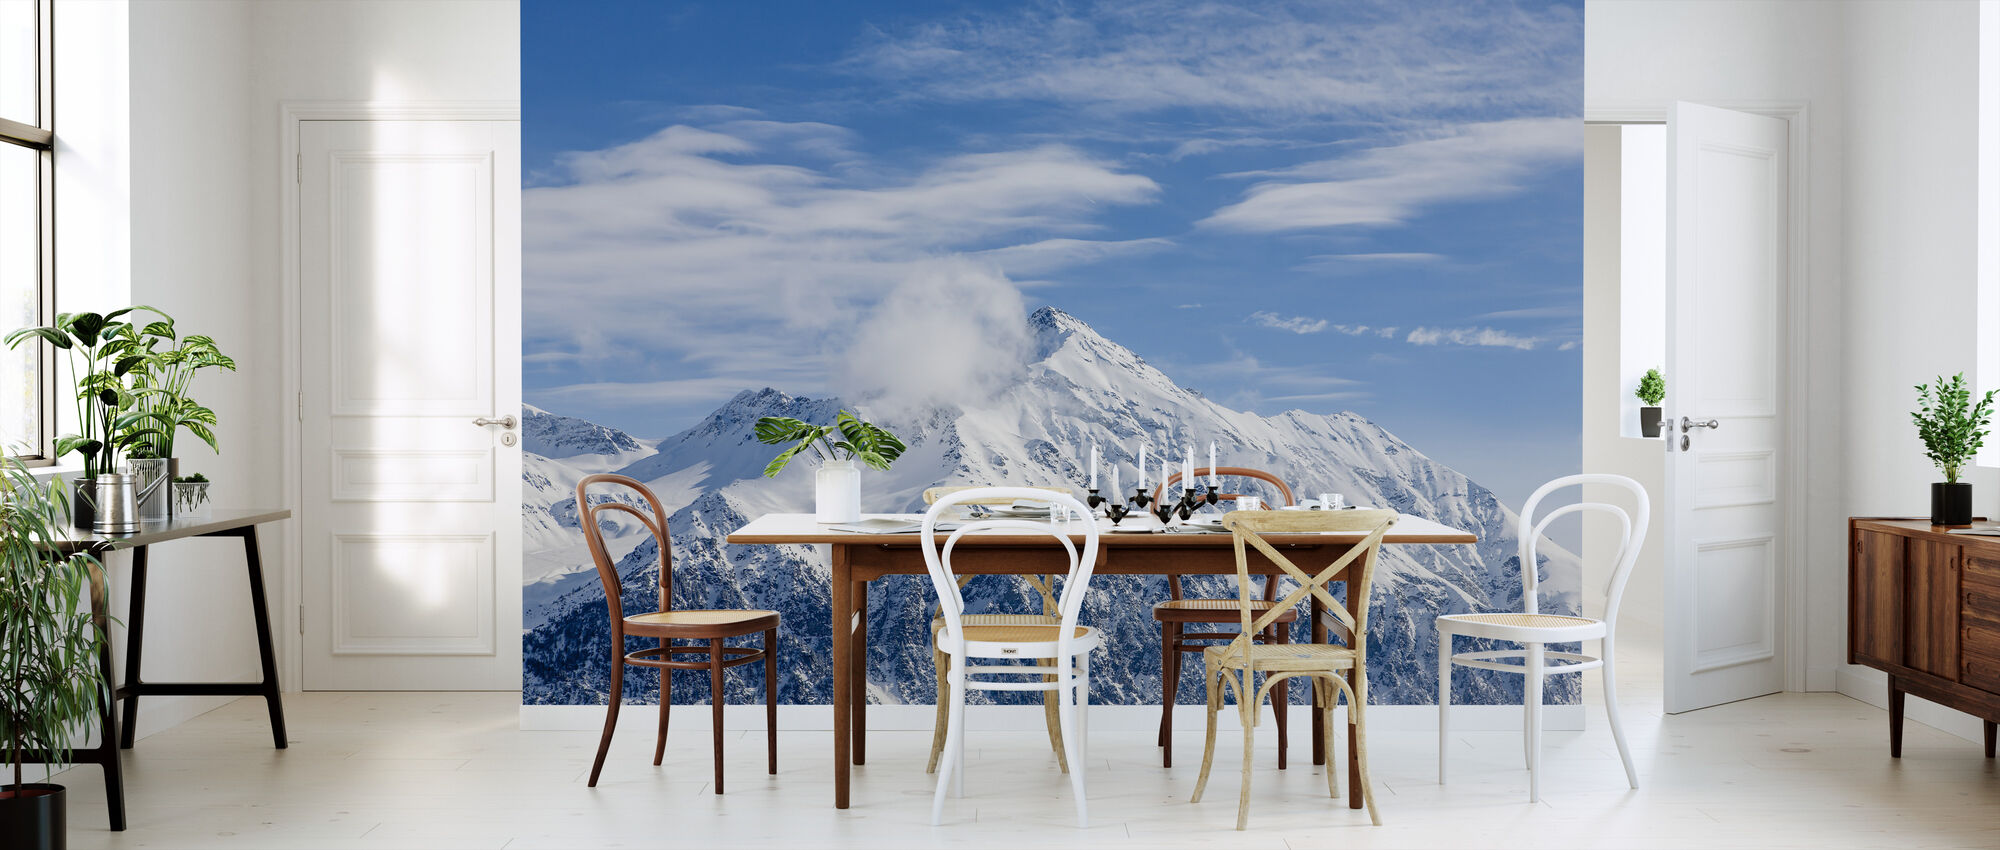 Swiss Alps - Wallpaper - Kitchen